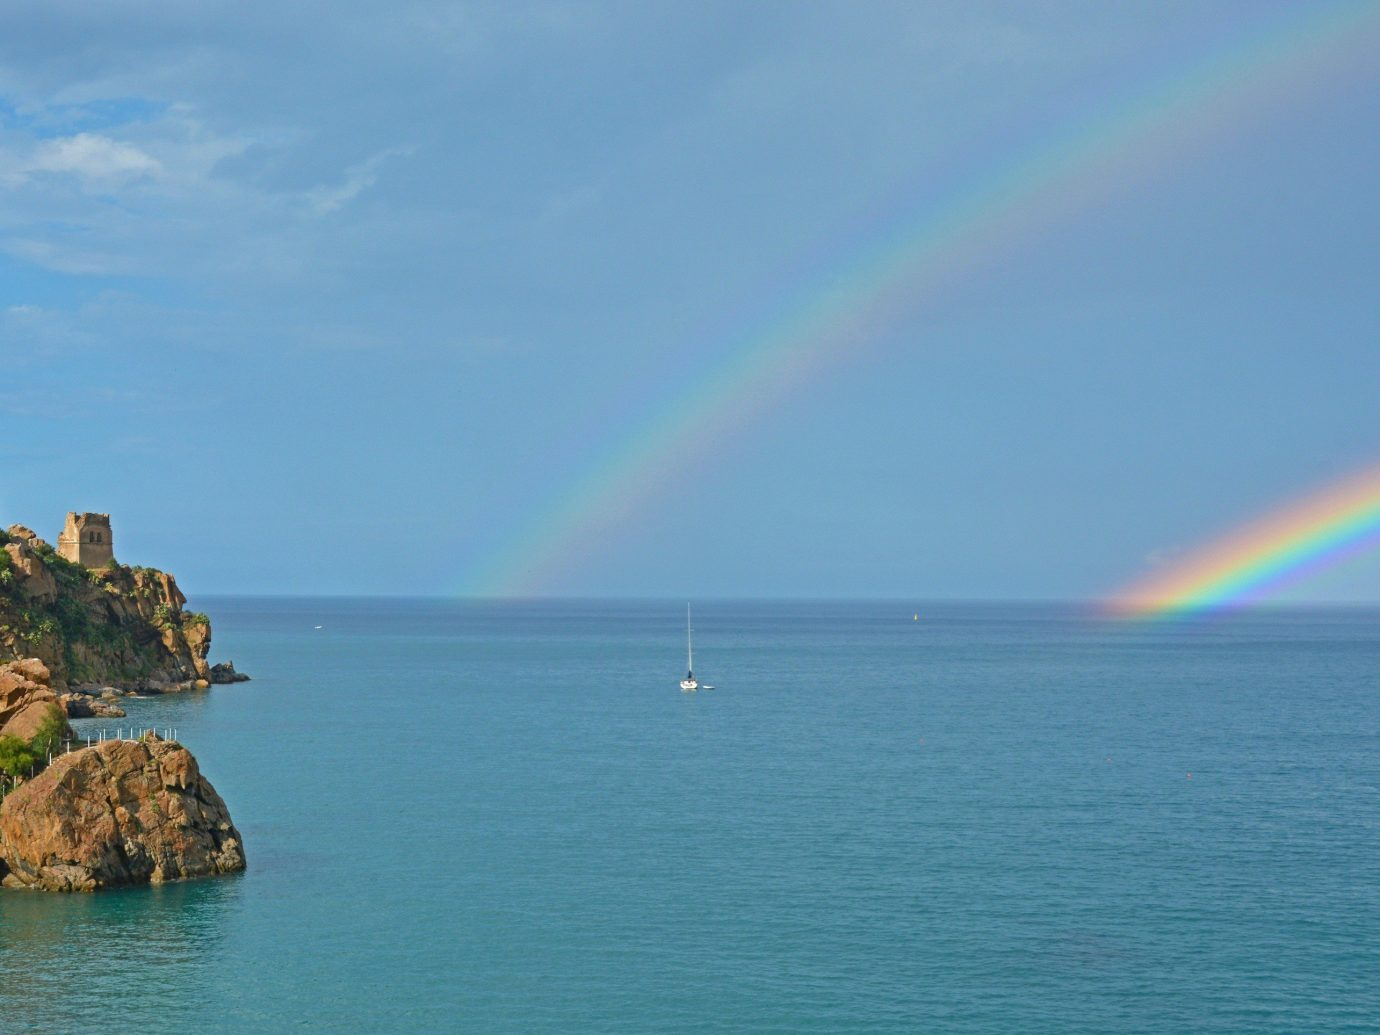 Trip Ideas water Nature outdoor sky rainbow horizon Sea Ocean meteorological phenomenon Coast bay Island distance